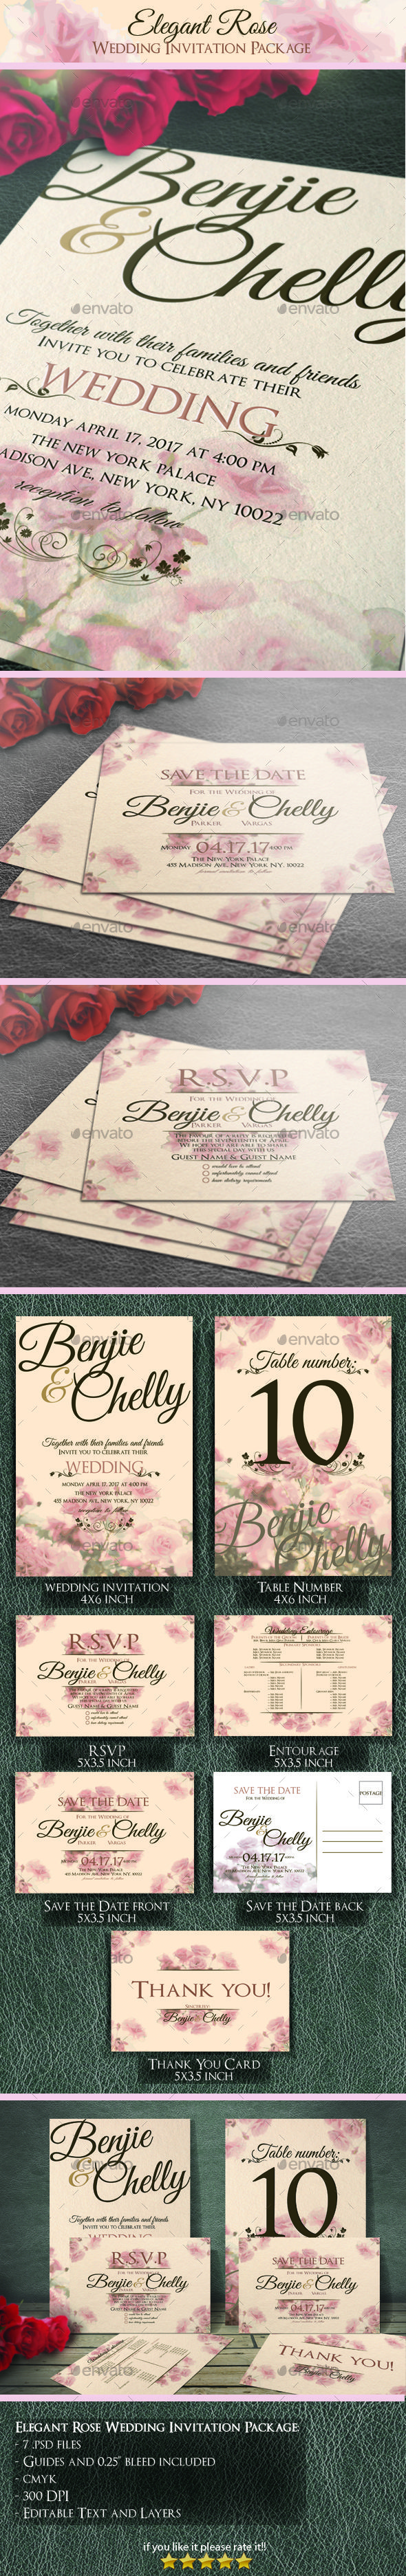 Elegant Rose Wedding Invitation Package - #Weddings #Cards & #Invites Download here: https://graphicriver.net/item/elegant-rose-wedding-invitation-package/19435872?ref=alena994